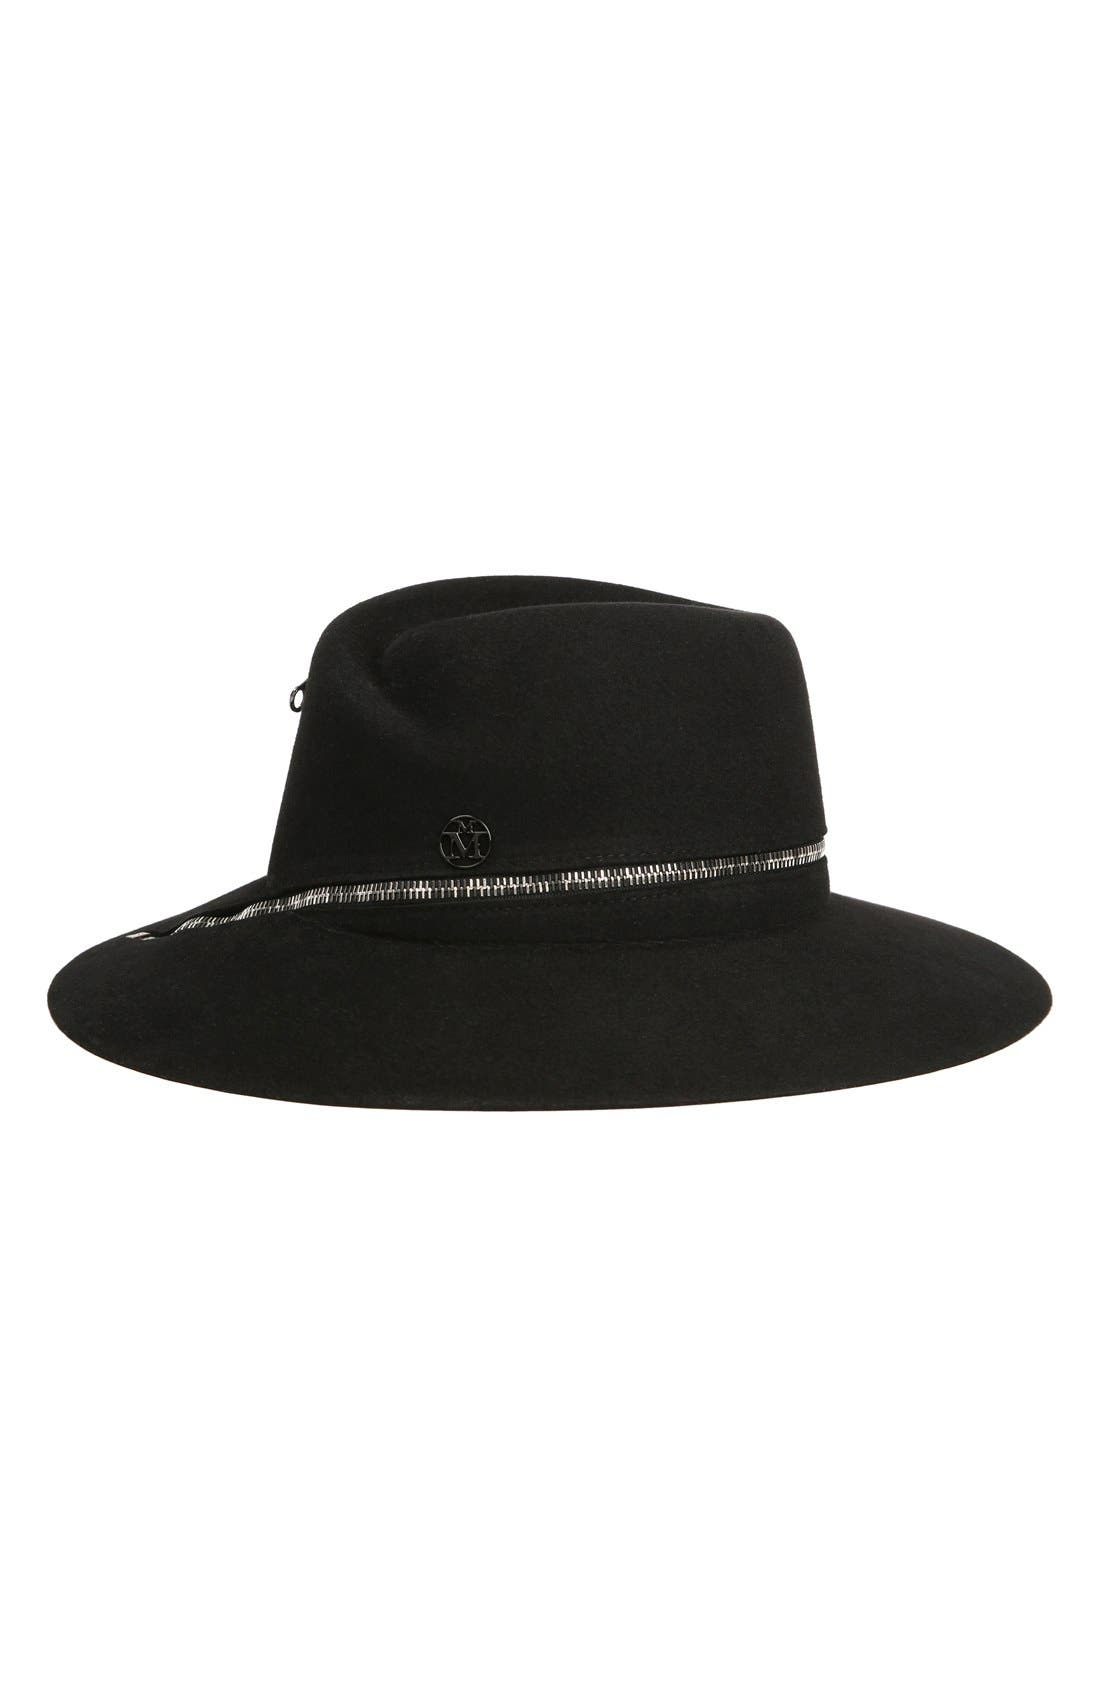 Main Image - Maison Michel Virginie Fur Felt Hat